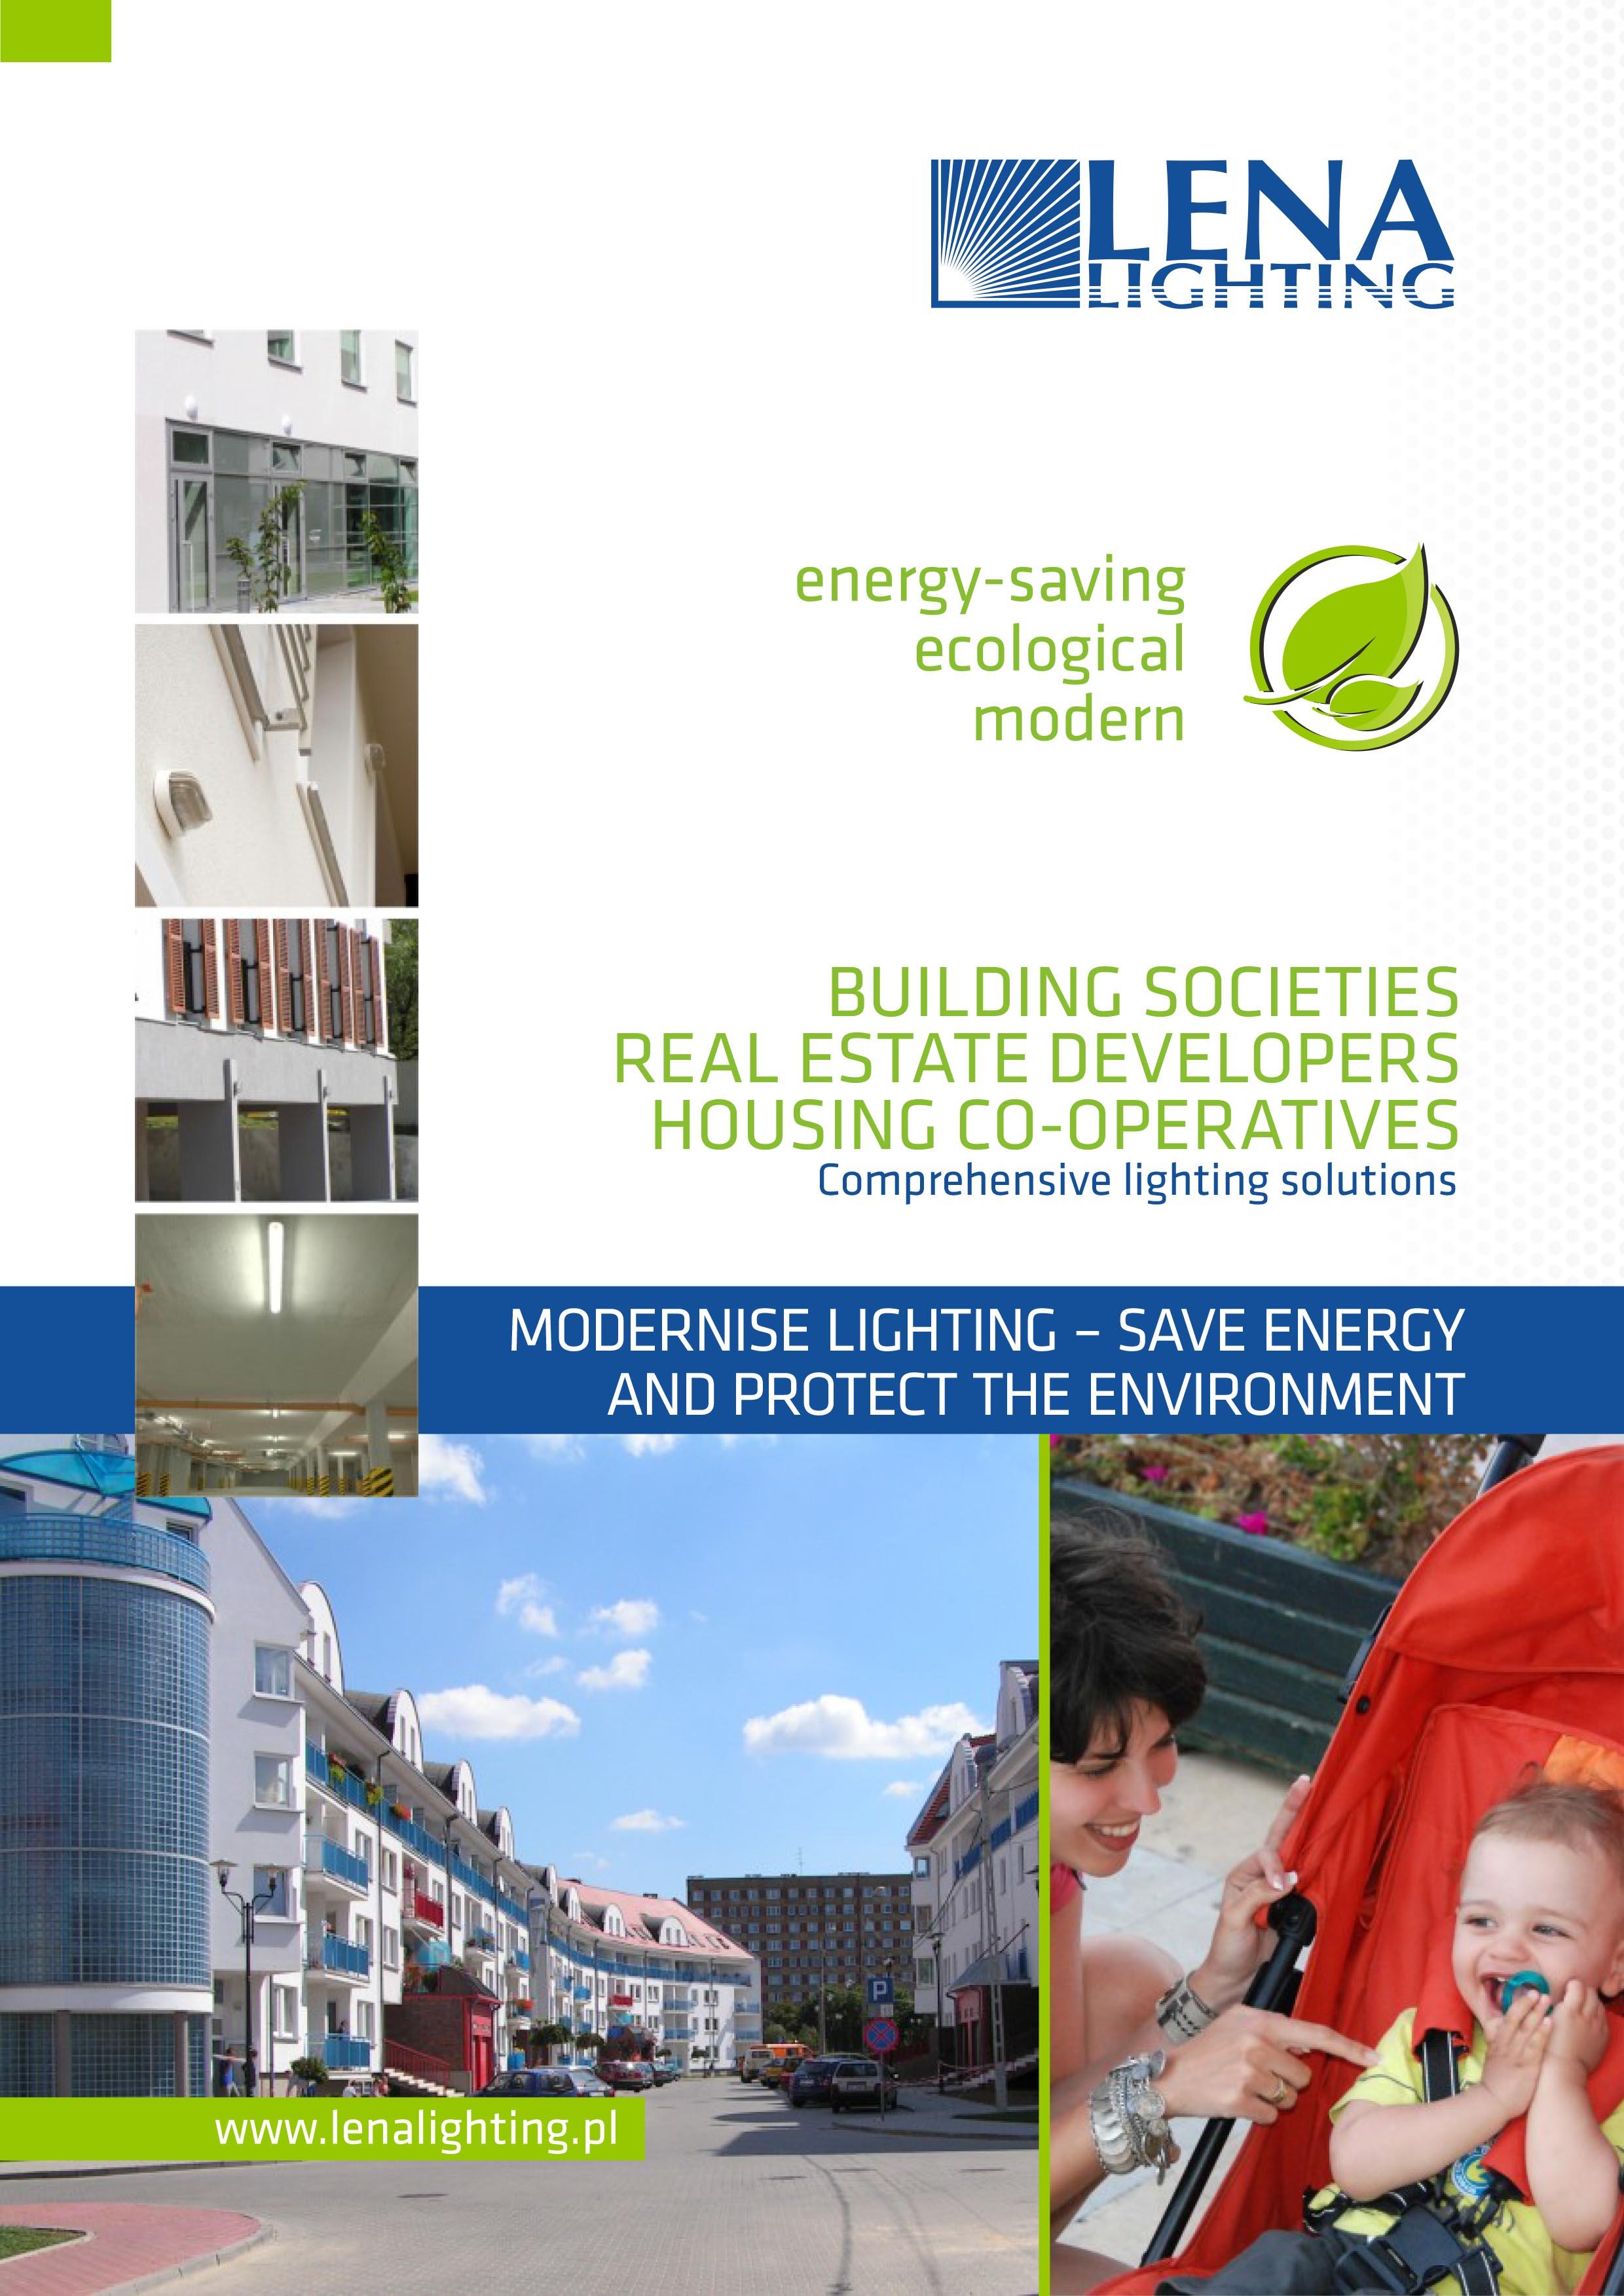 Ideias poupança de energia by LENA